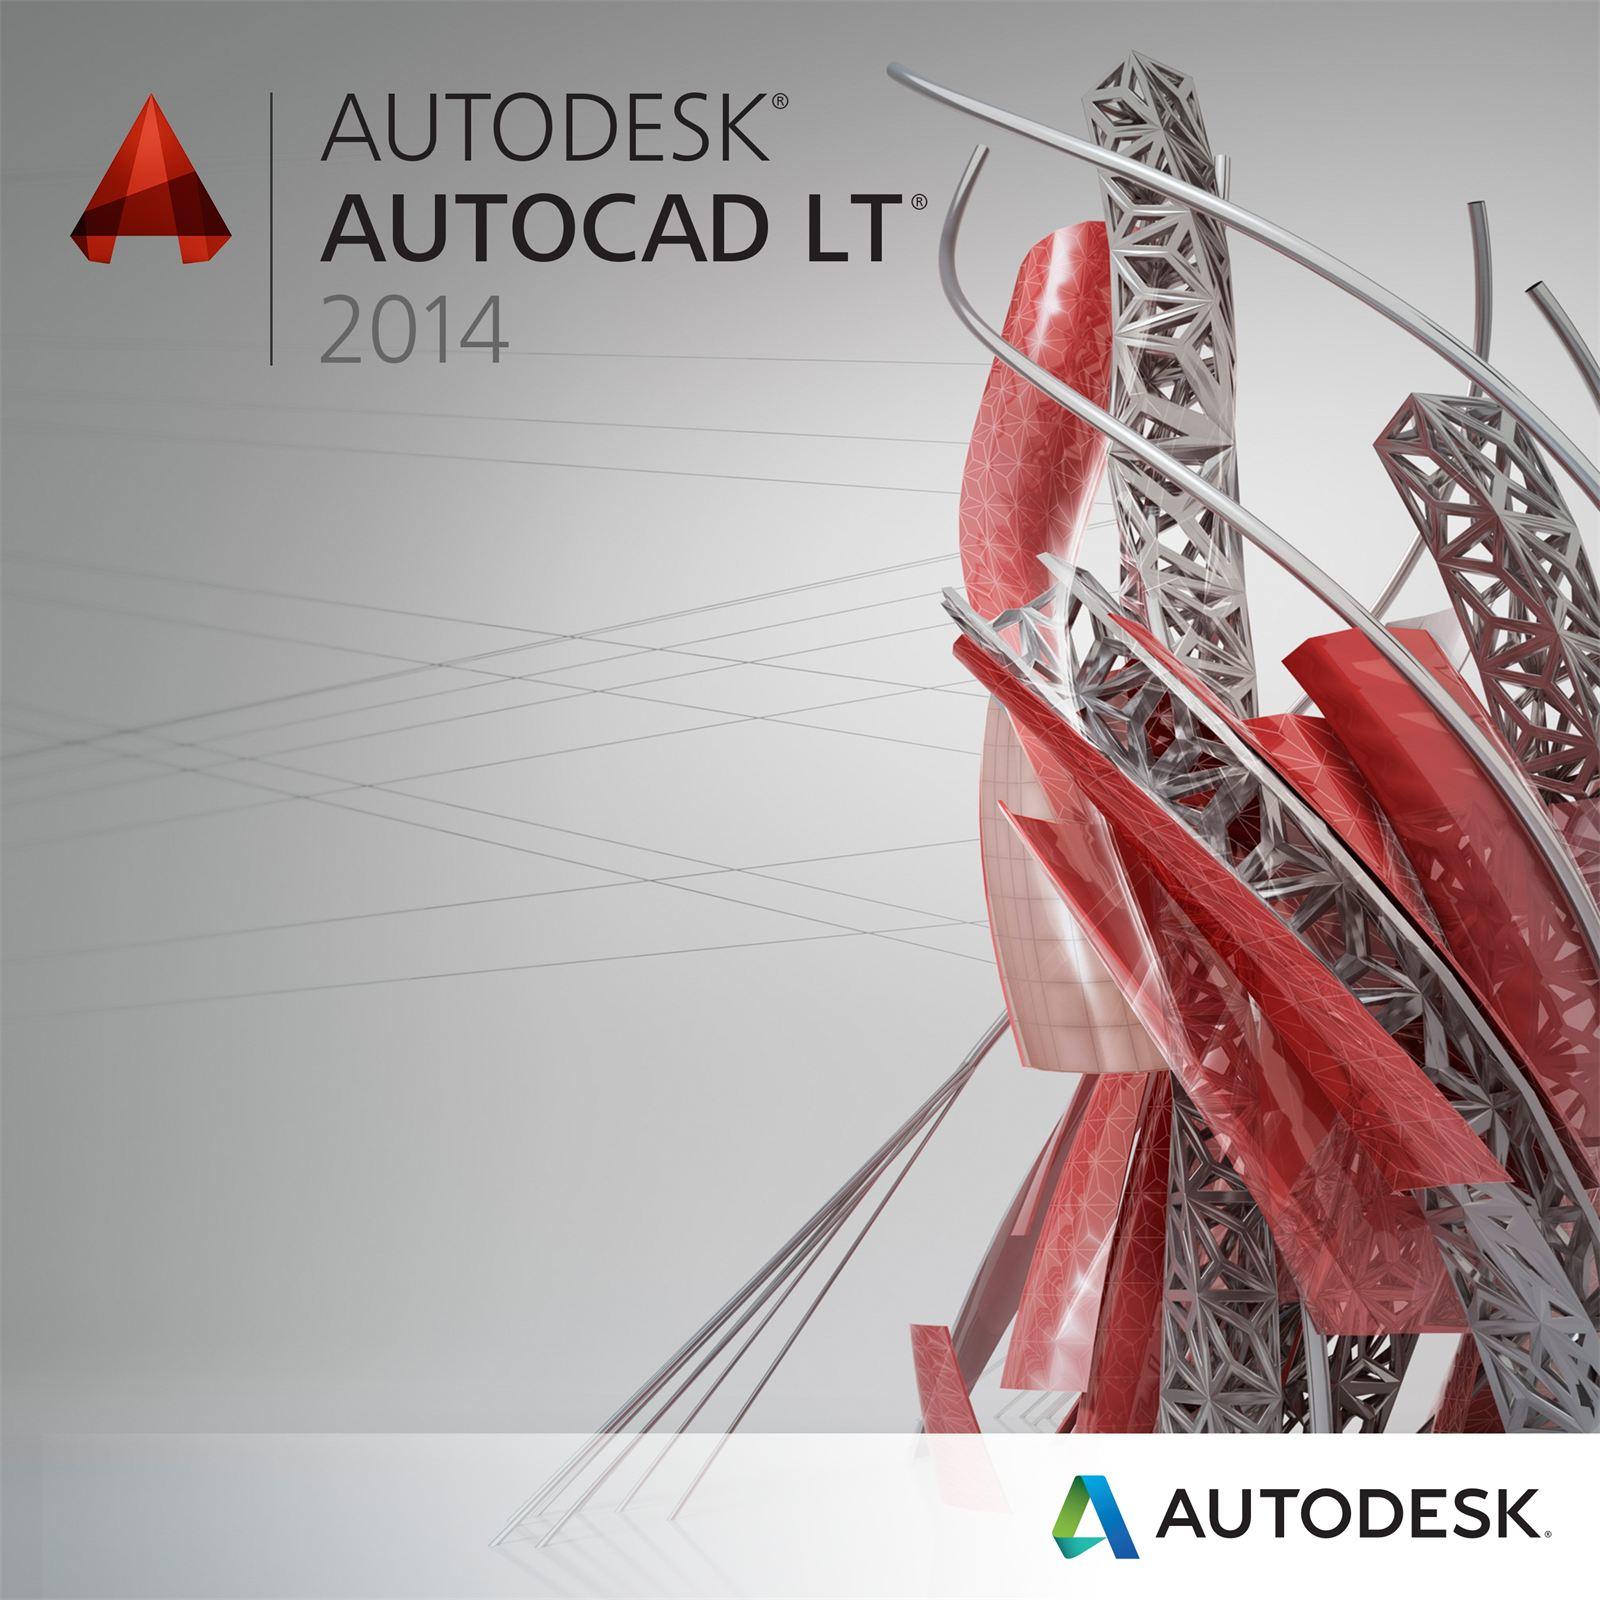 Autodesk AutoCAD LT